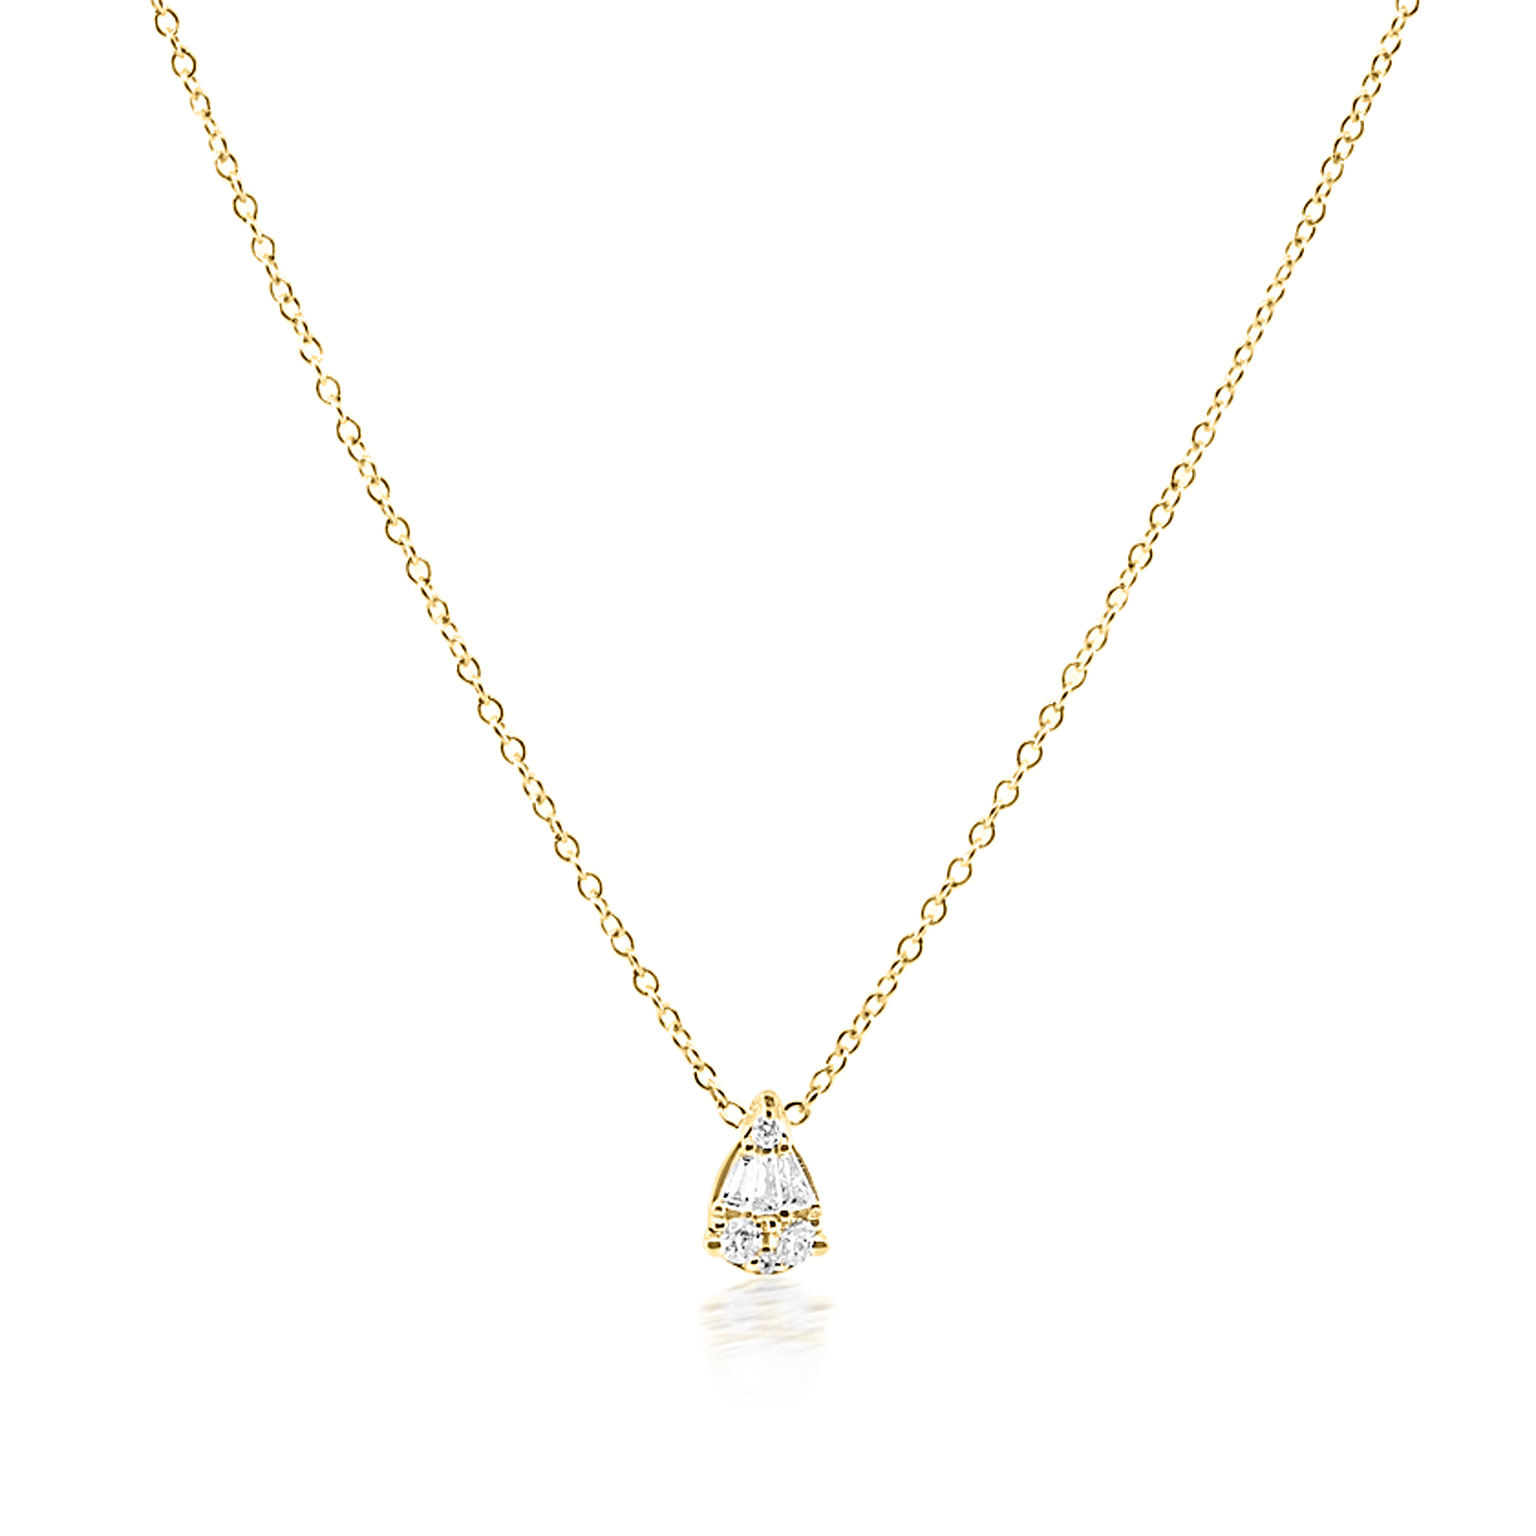 Trabert Goldsmiths Pear Shaped Diamond Necklace